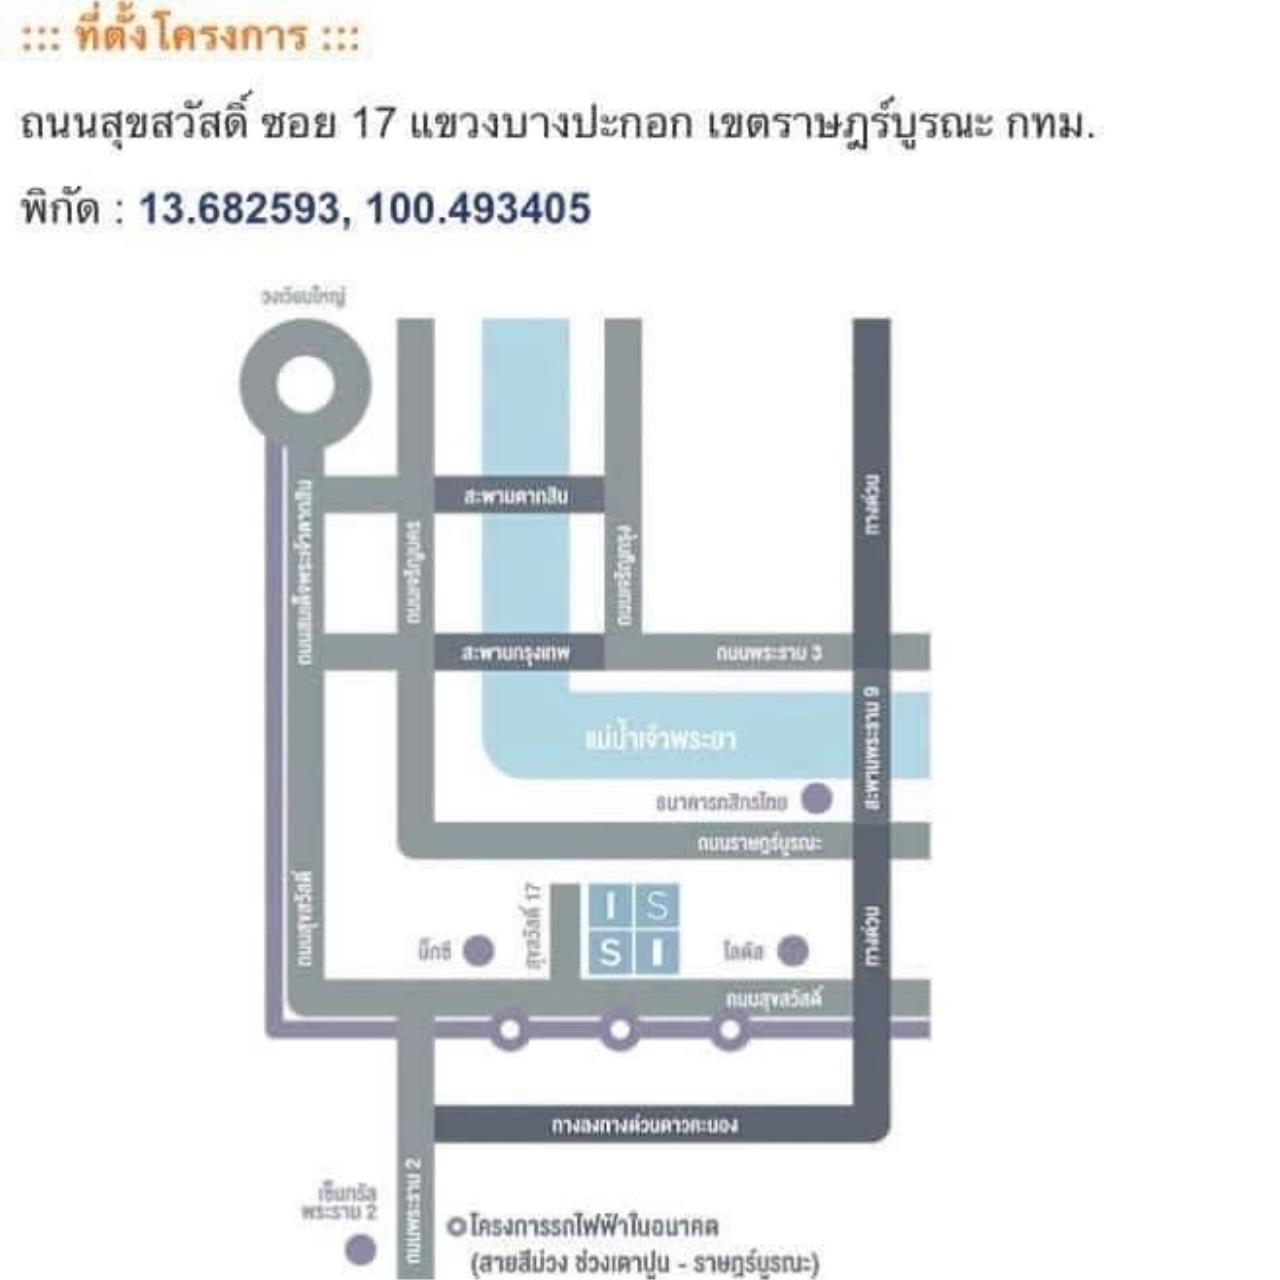 Agent - Phapayawarin Agency's ISSI Condo Suksawat for Sale, 1 Bedroom 1 Bathroom, 25 Sq.m. 13